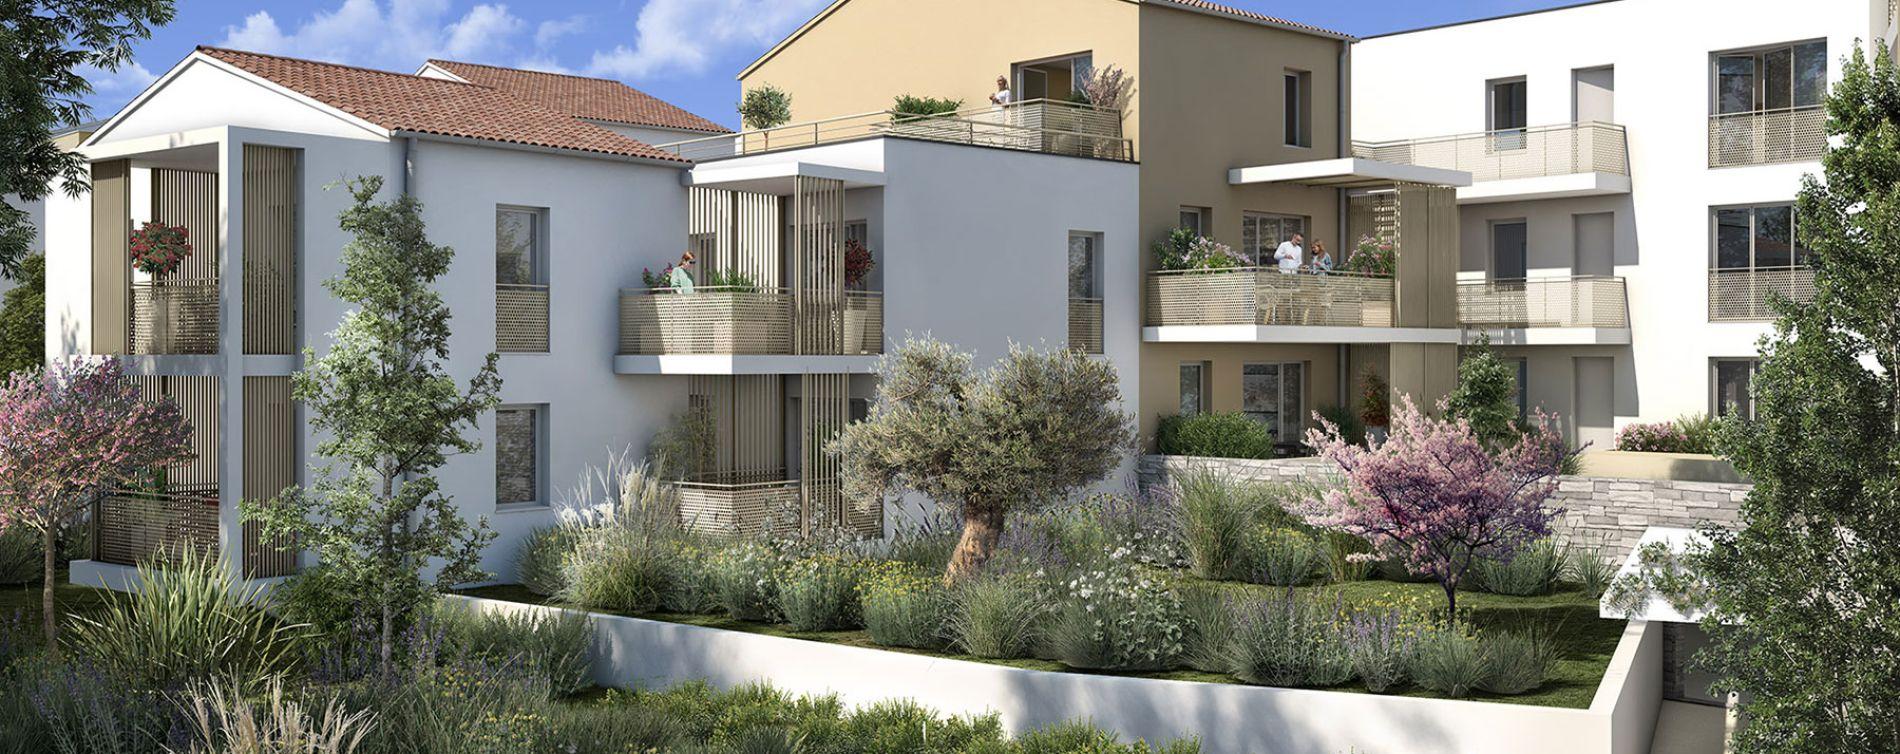 Meyreuil : programme immobilier neuve « Terra Rosa » en Loi Pinel